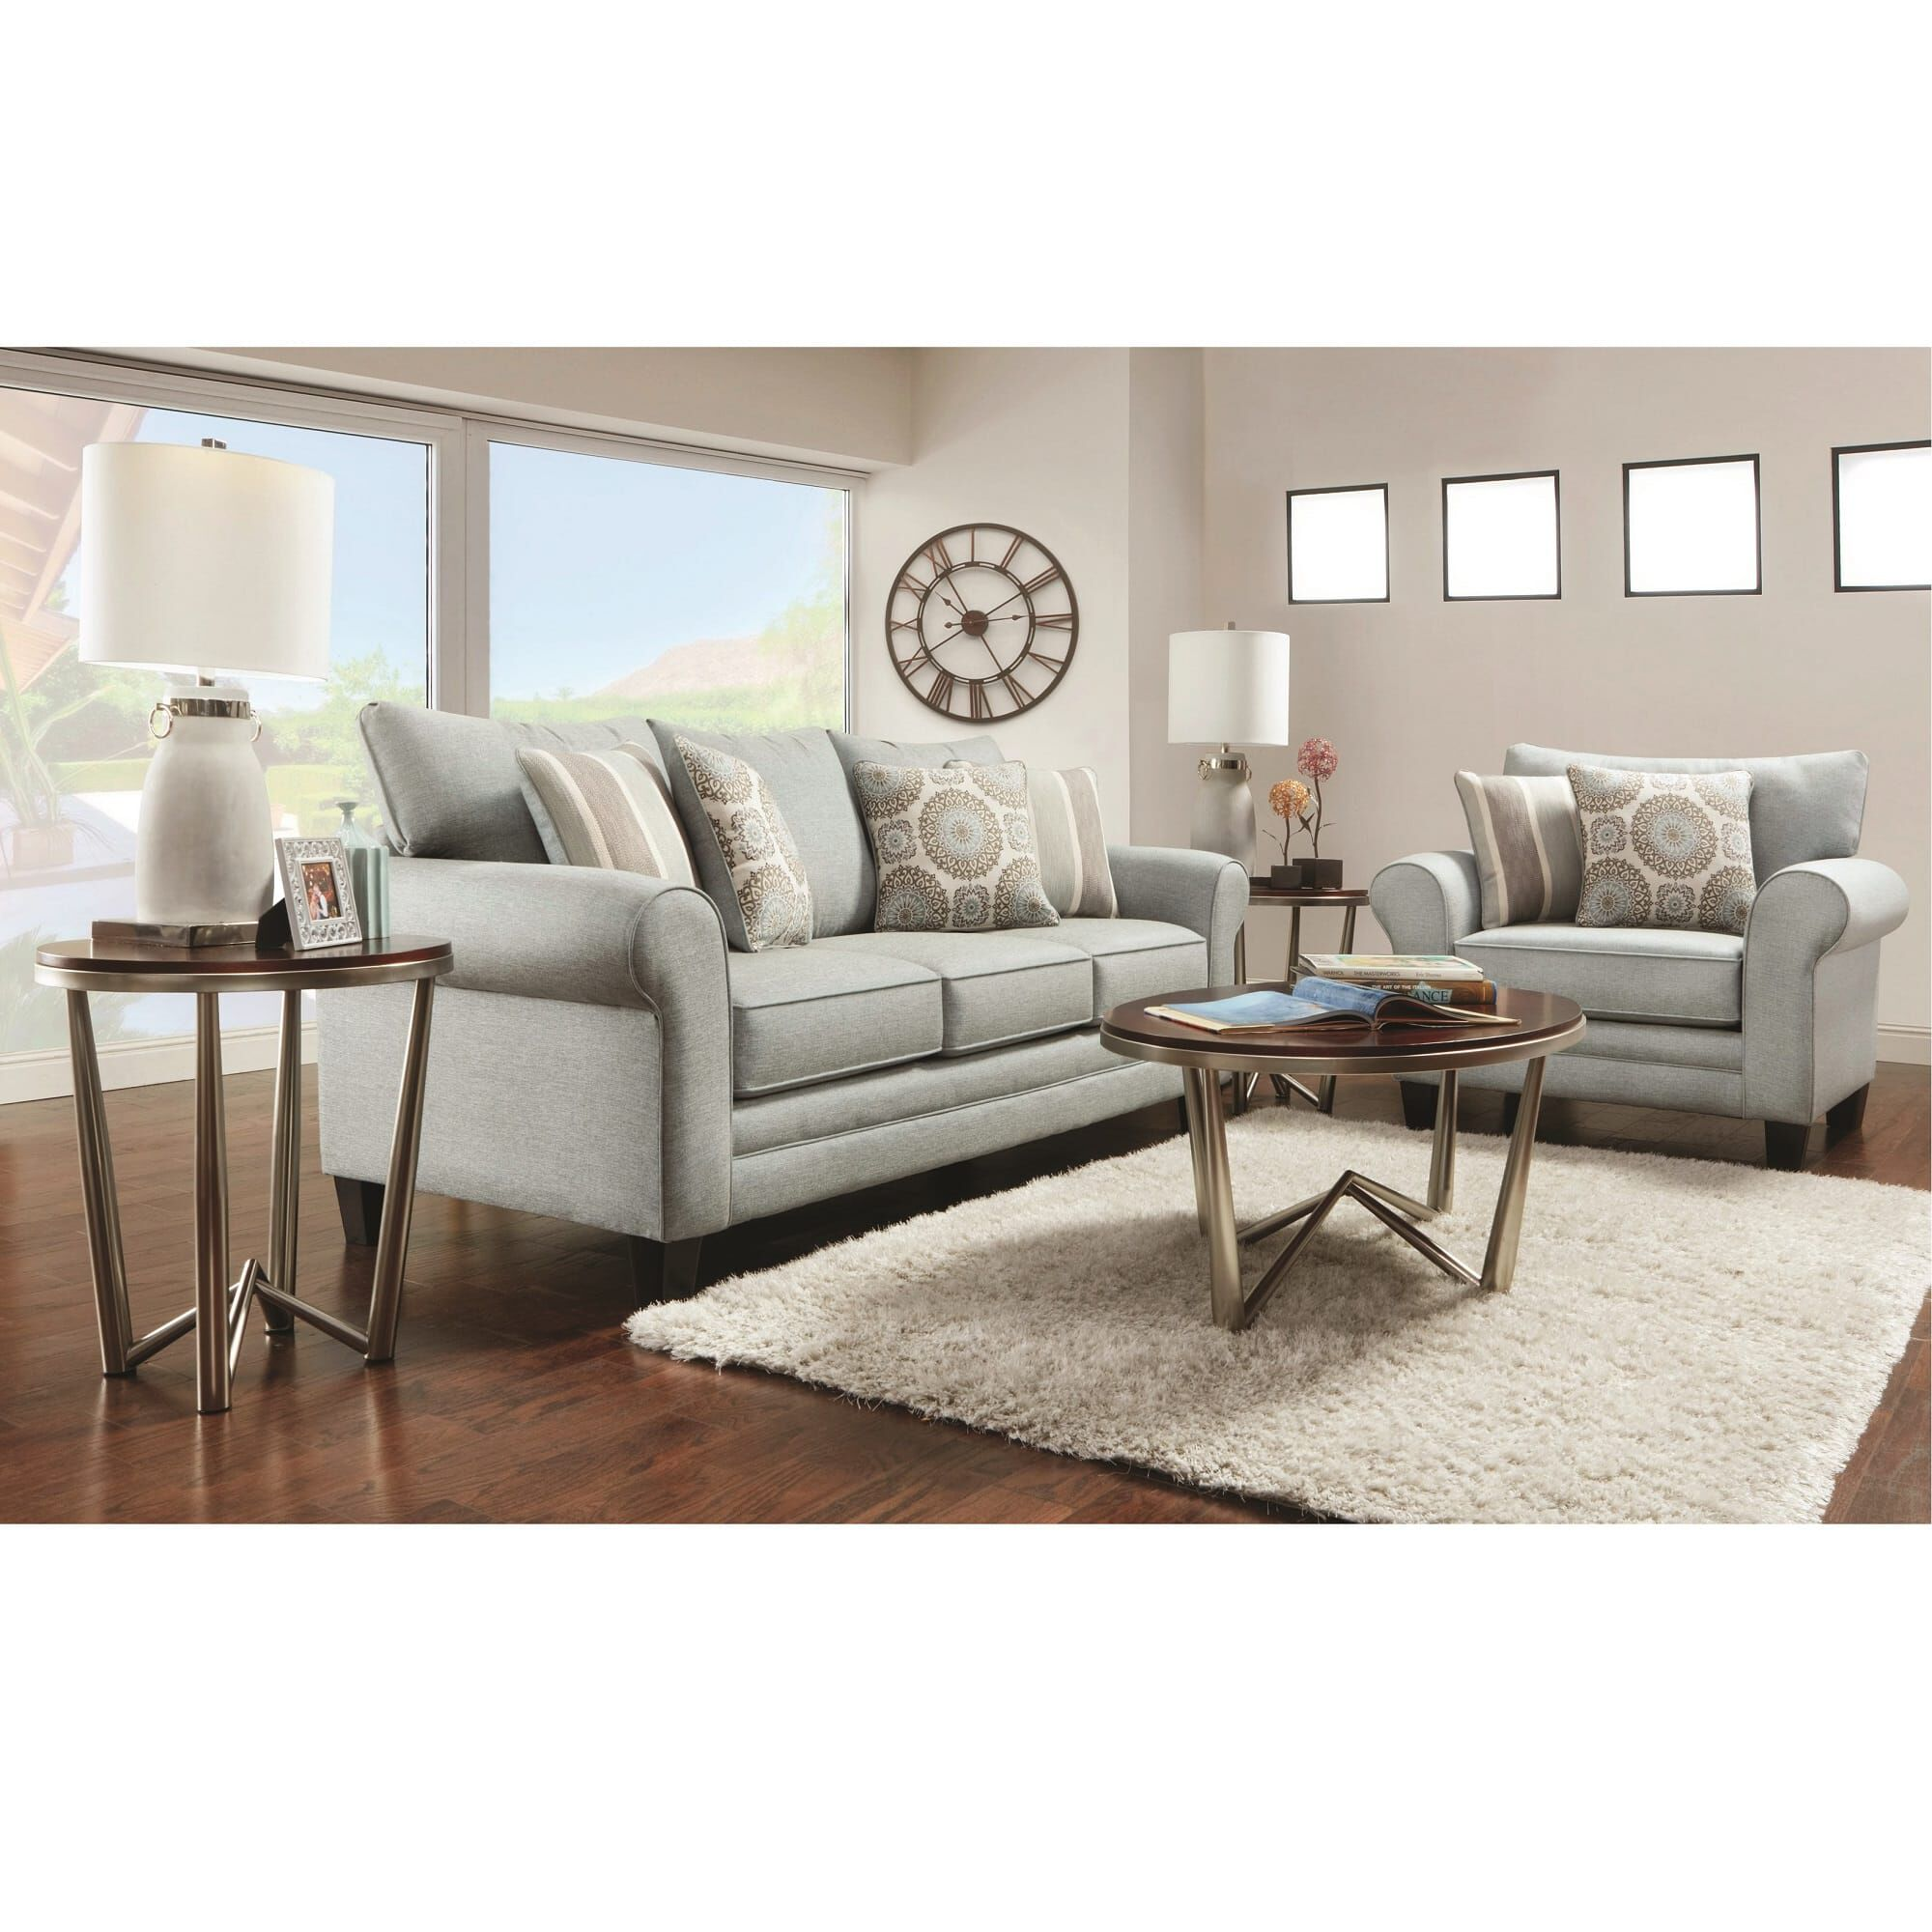 Fusion Furniture Living Room Sets 2 Piece Lara Living Room